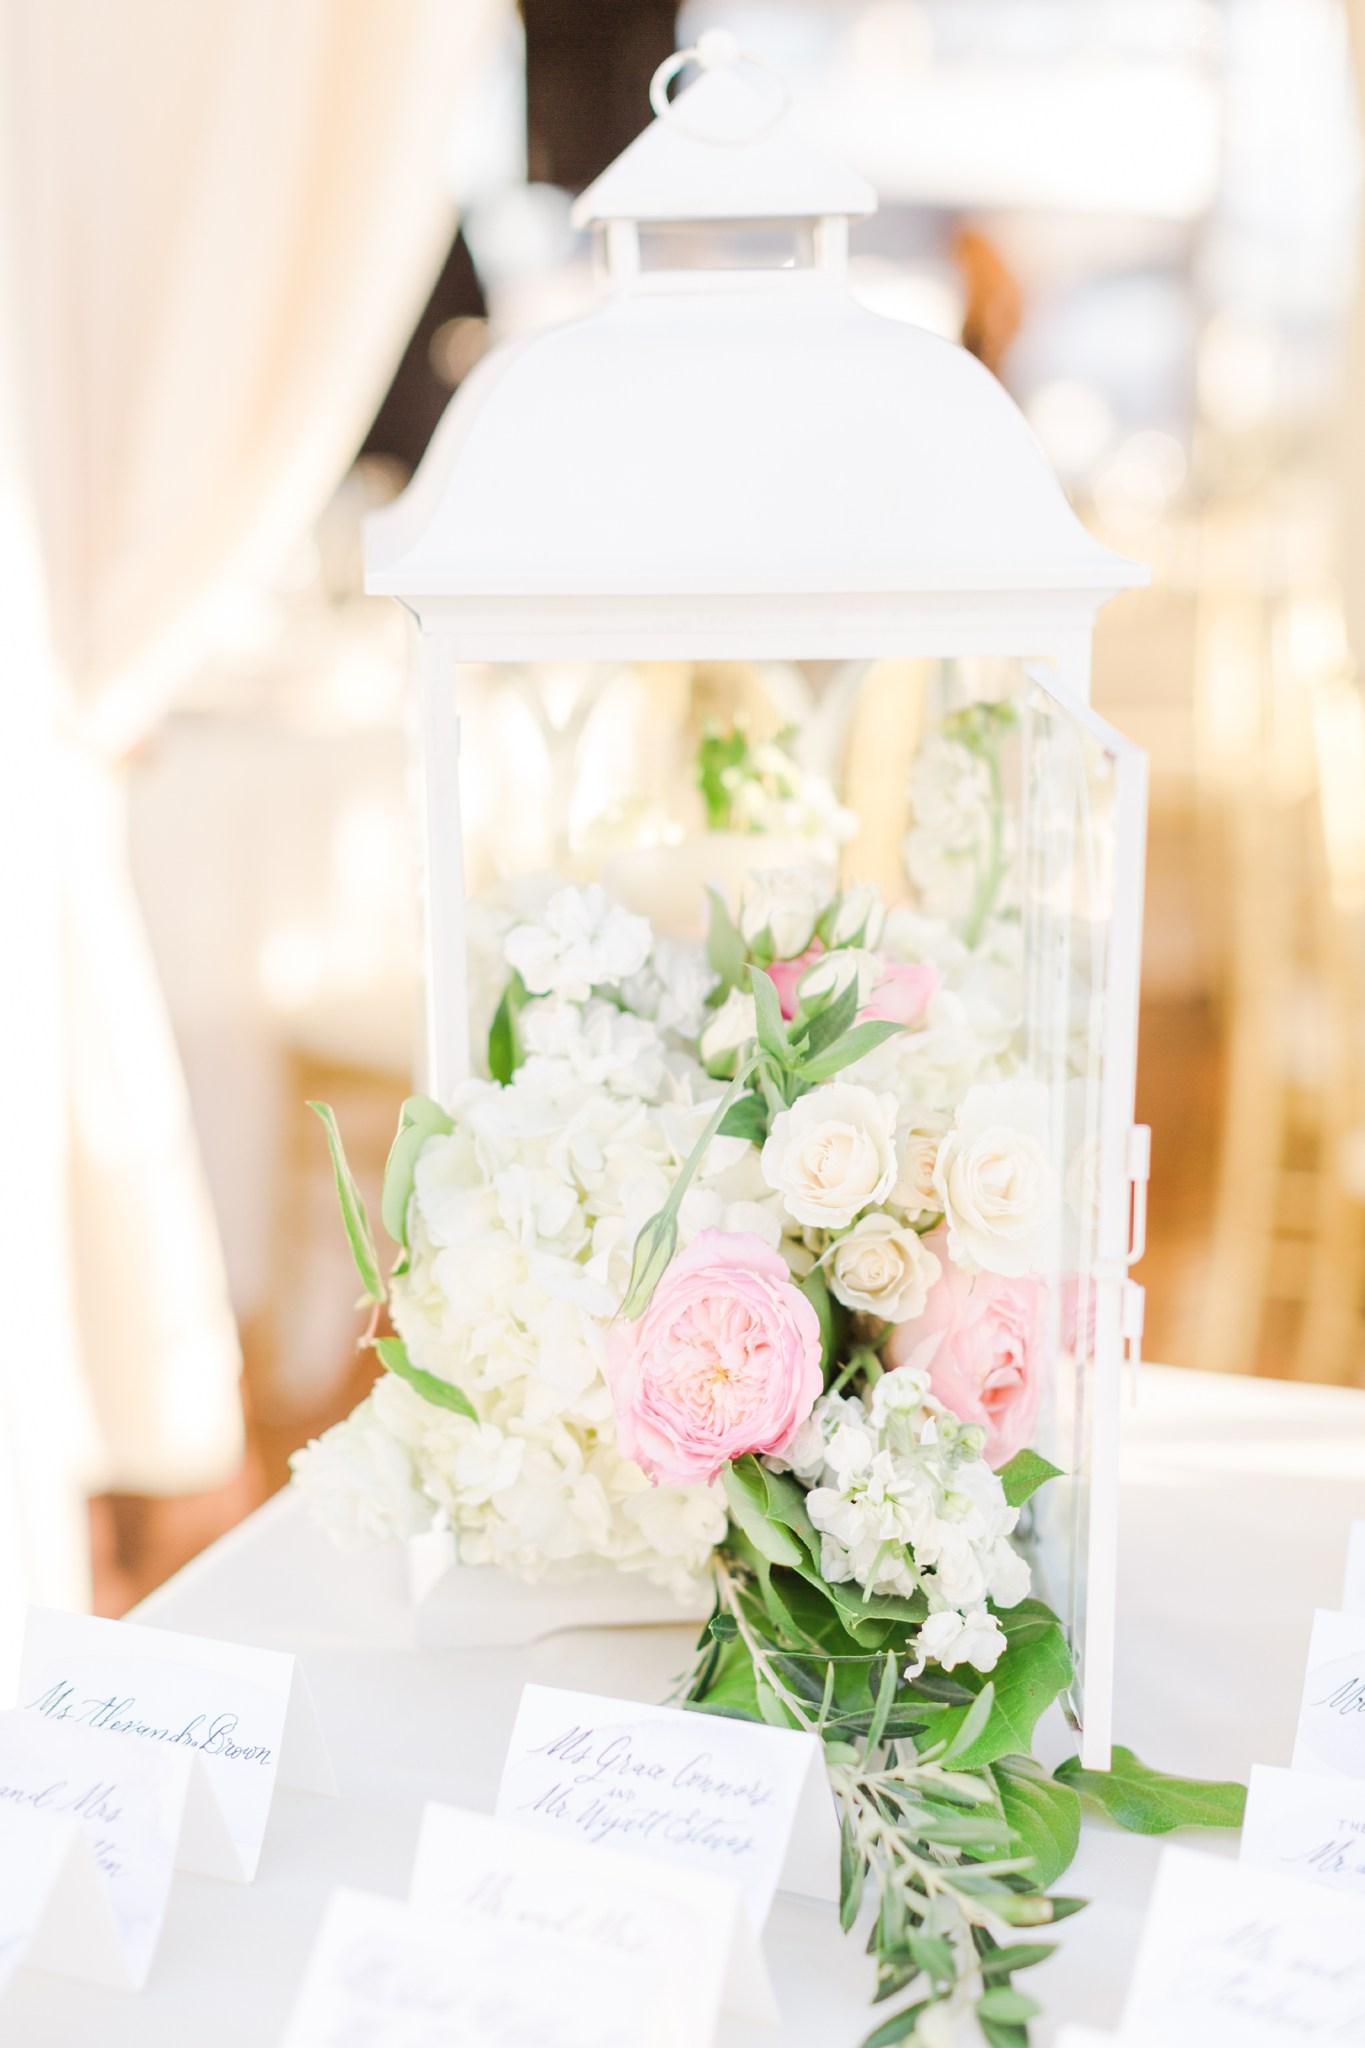 deborah_zoe_photography_best_of_flowers_2016_00016.JPG